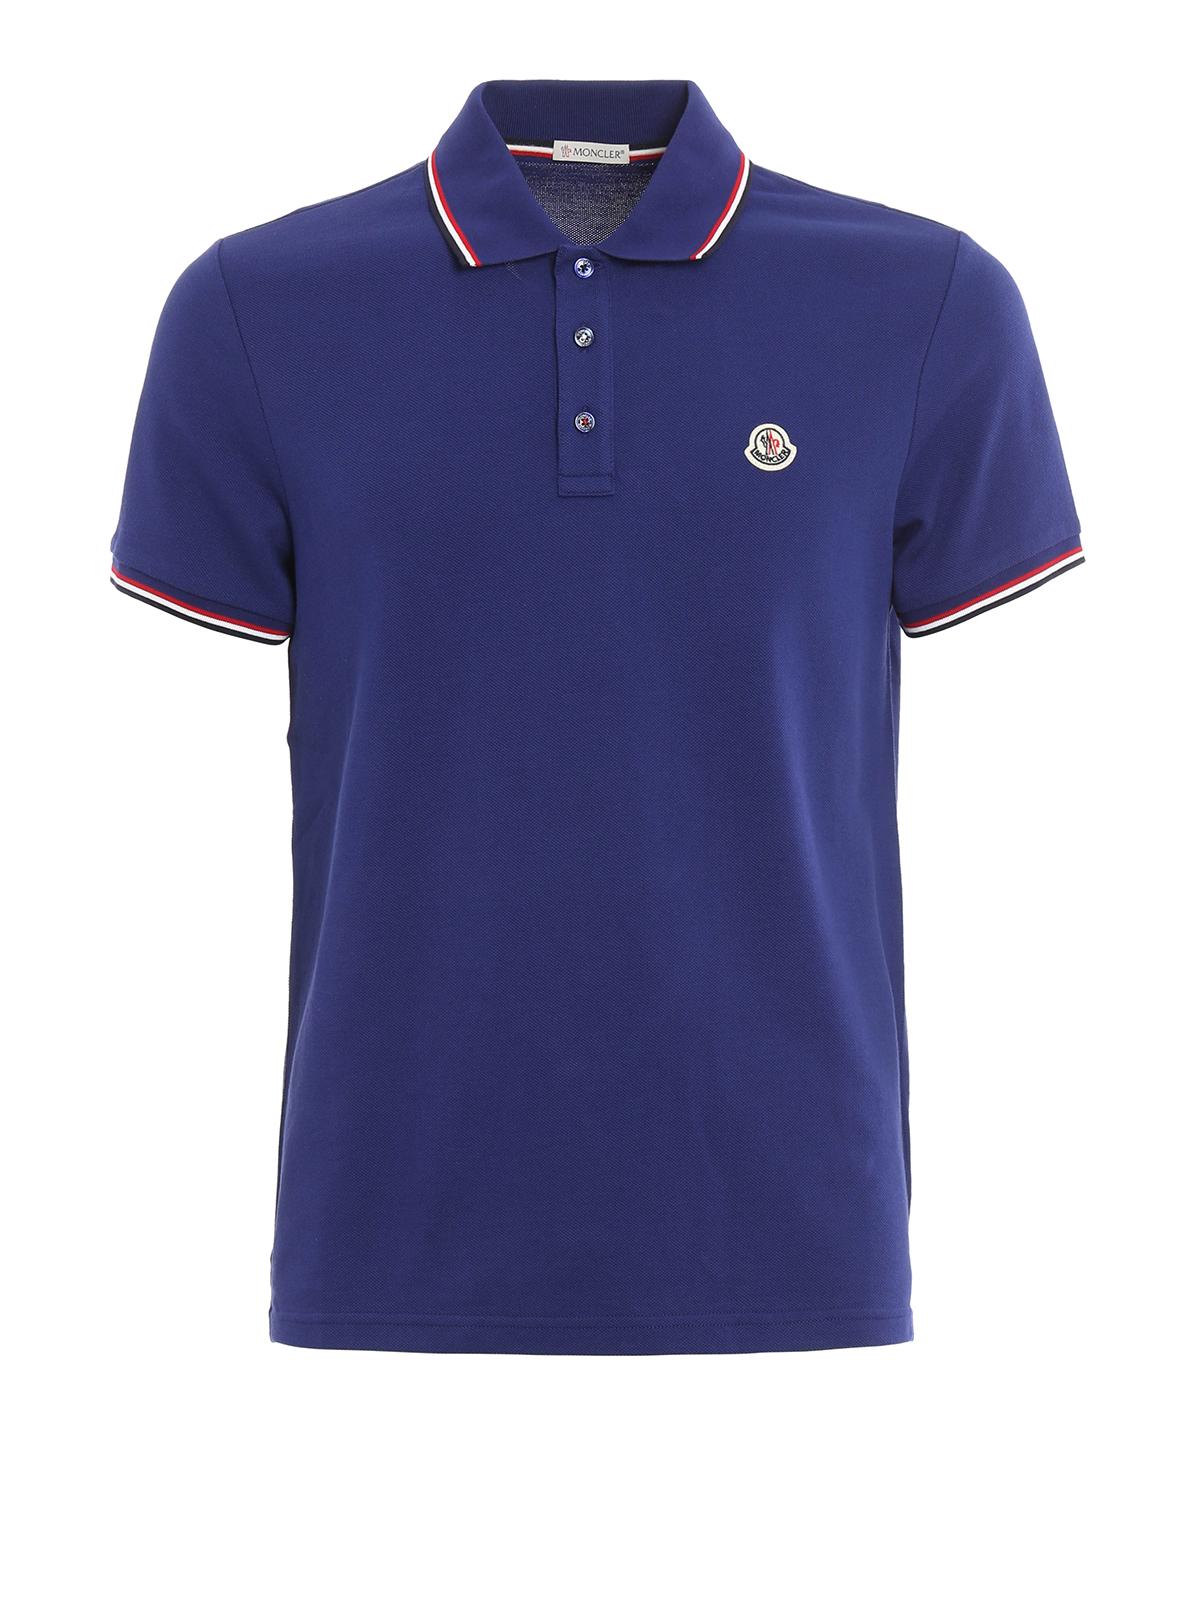 Cotton Pique Polo Shirt By Moncler Polo Shirts Ikrix